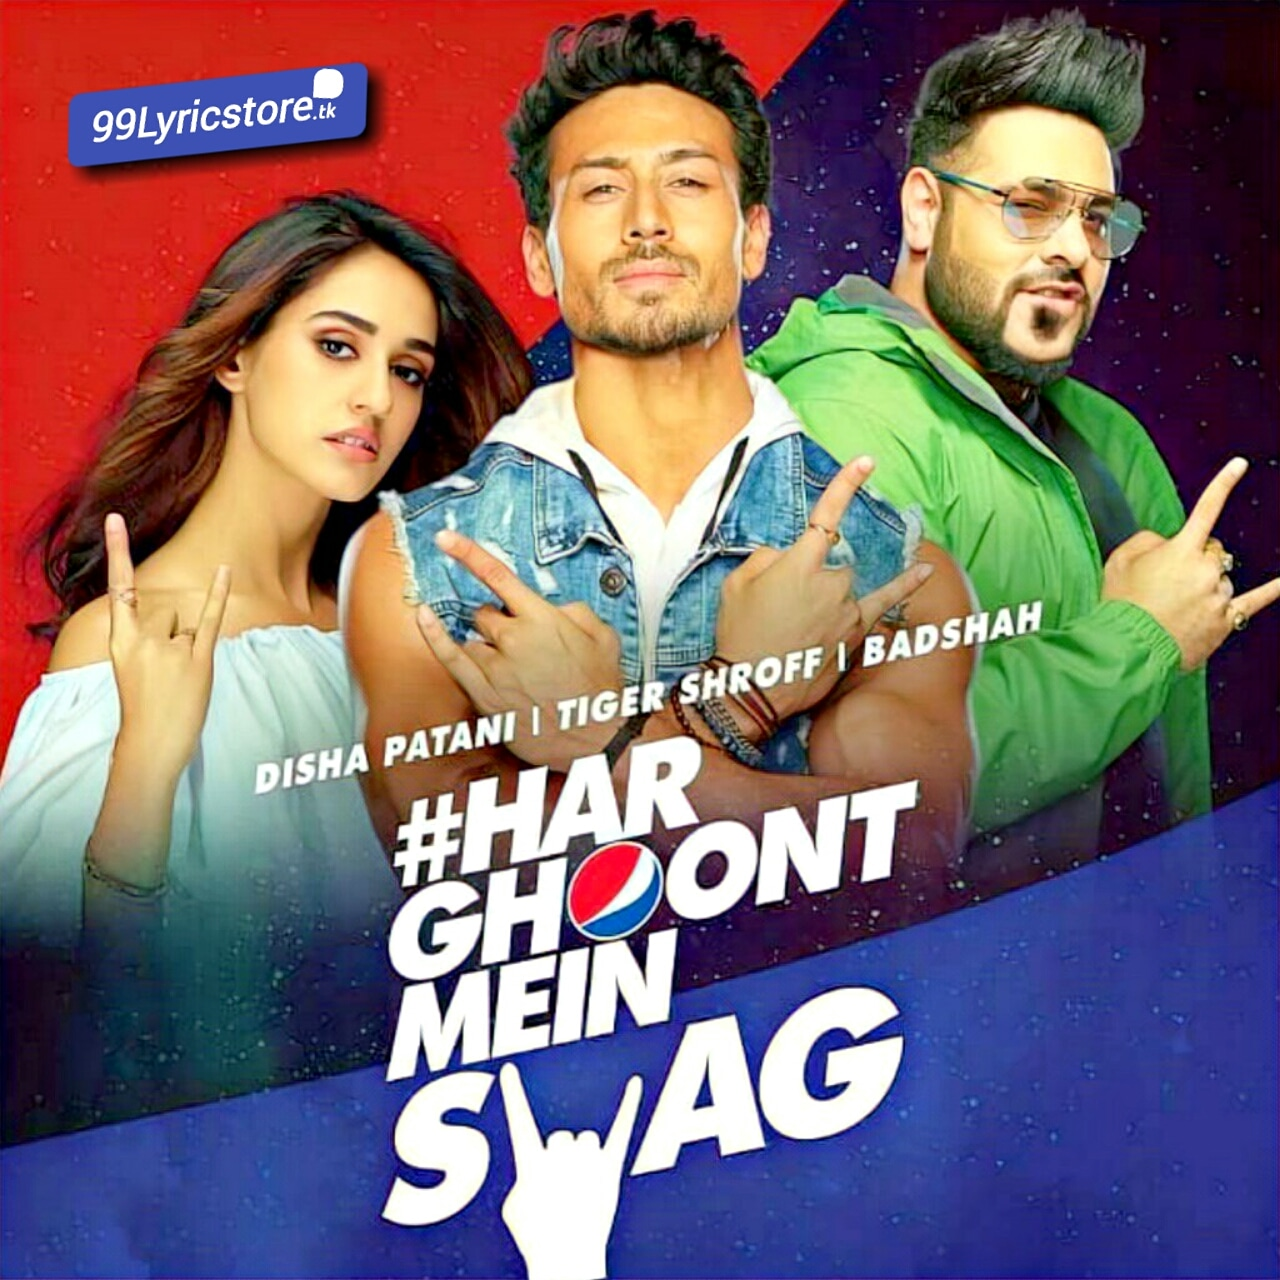 Har Ghoot Mein Swag Lyrics Sung by Badahah Ft. Tiger Shroff and Disha Patani